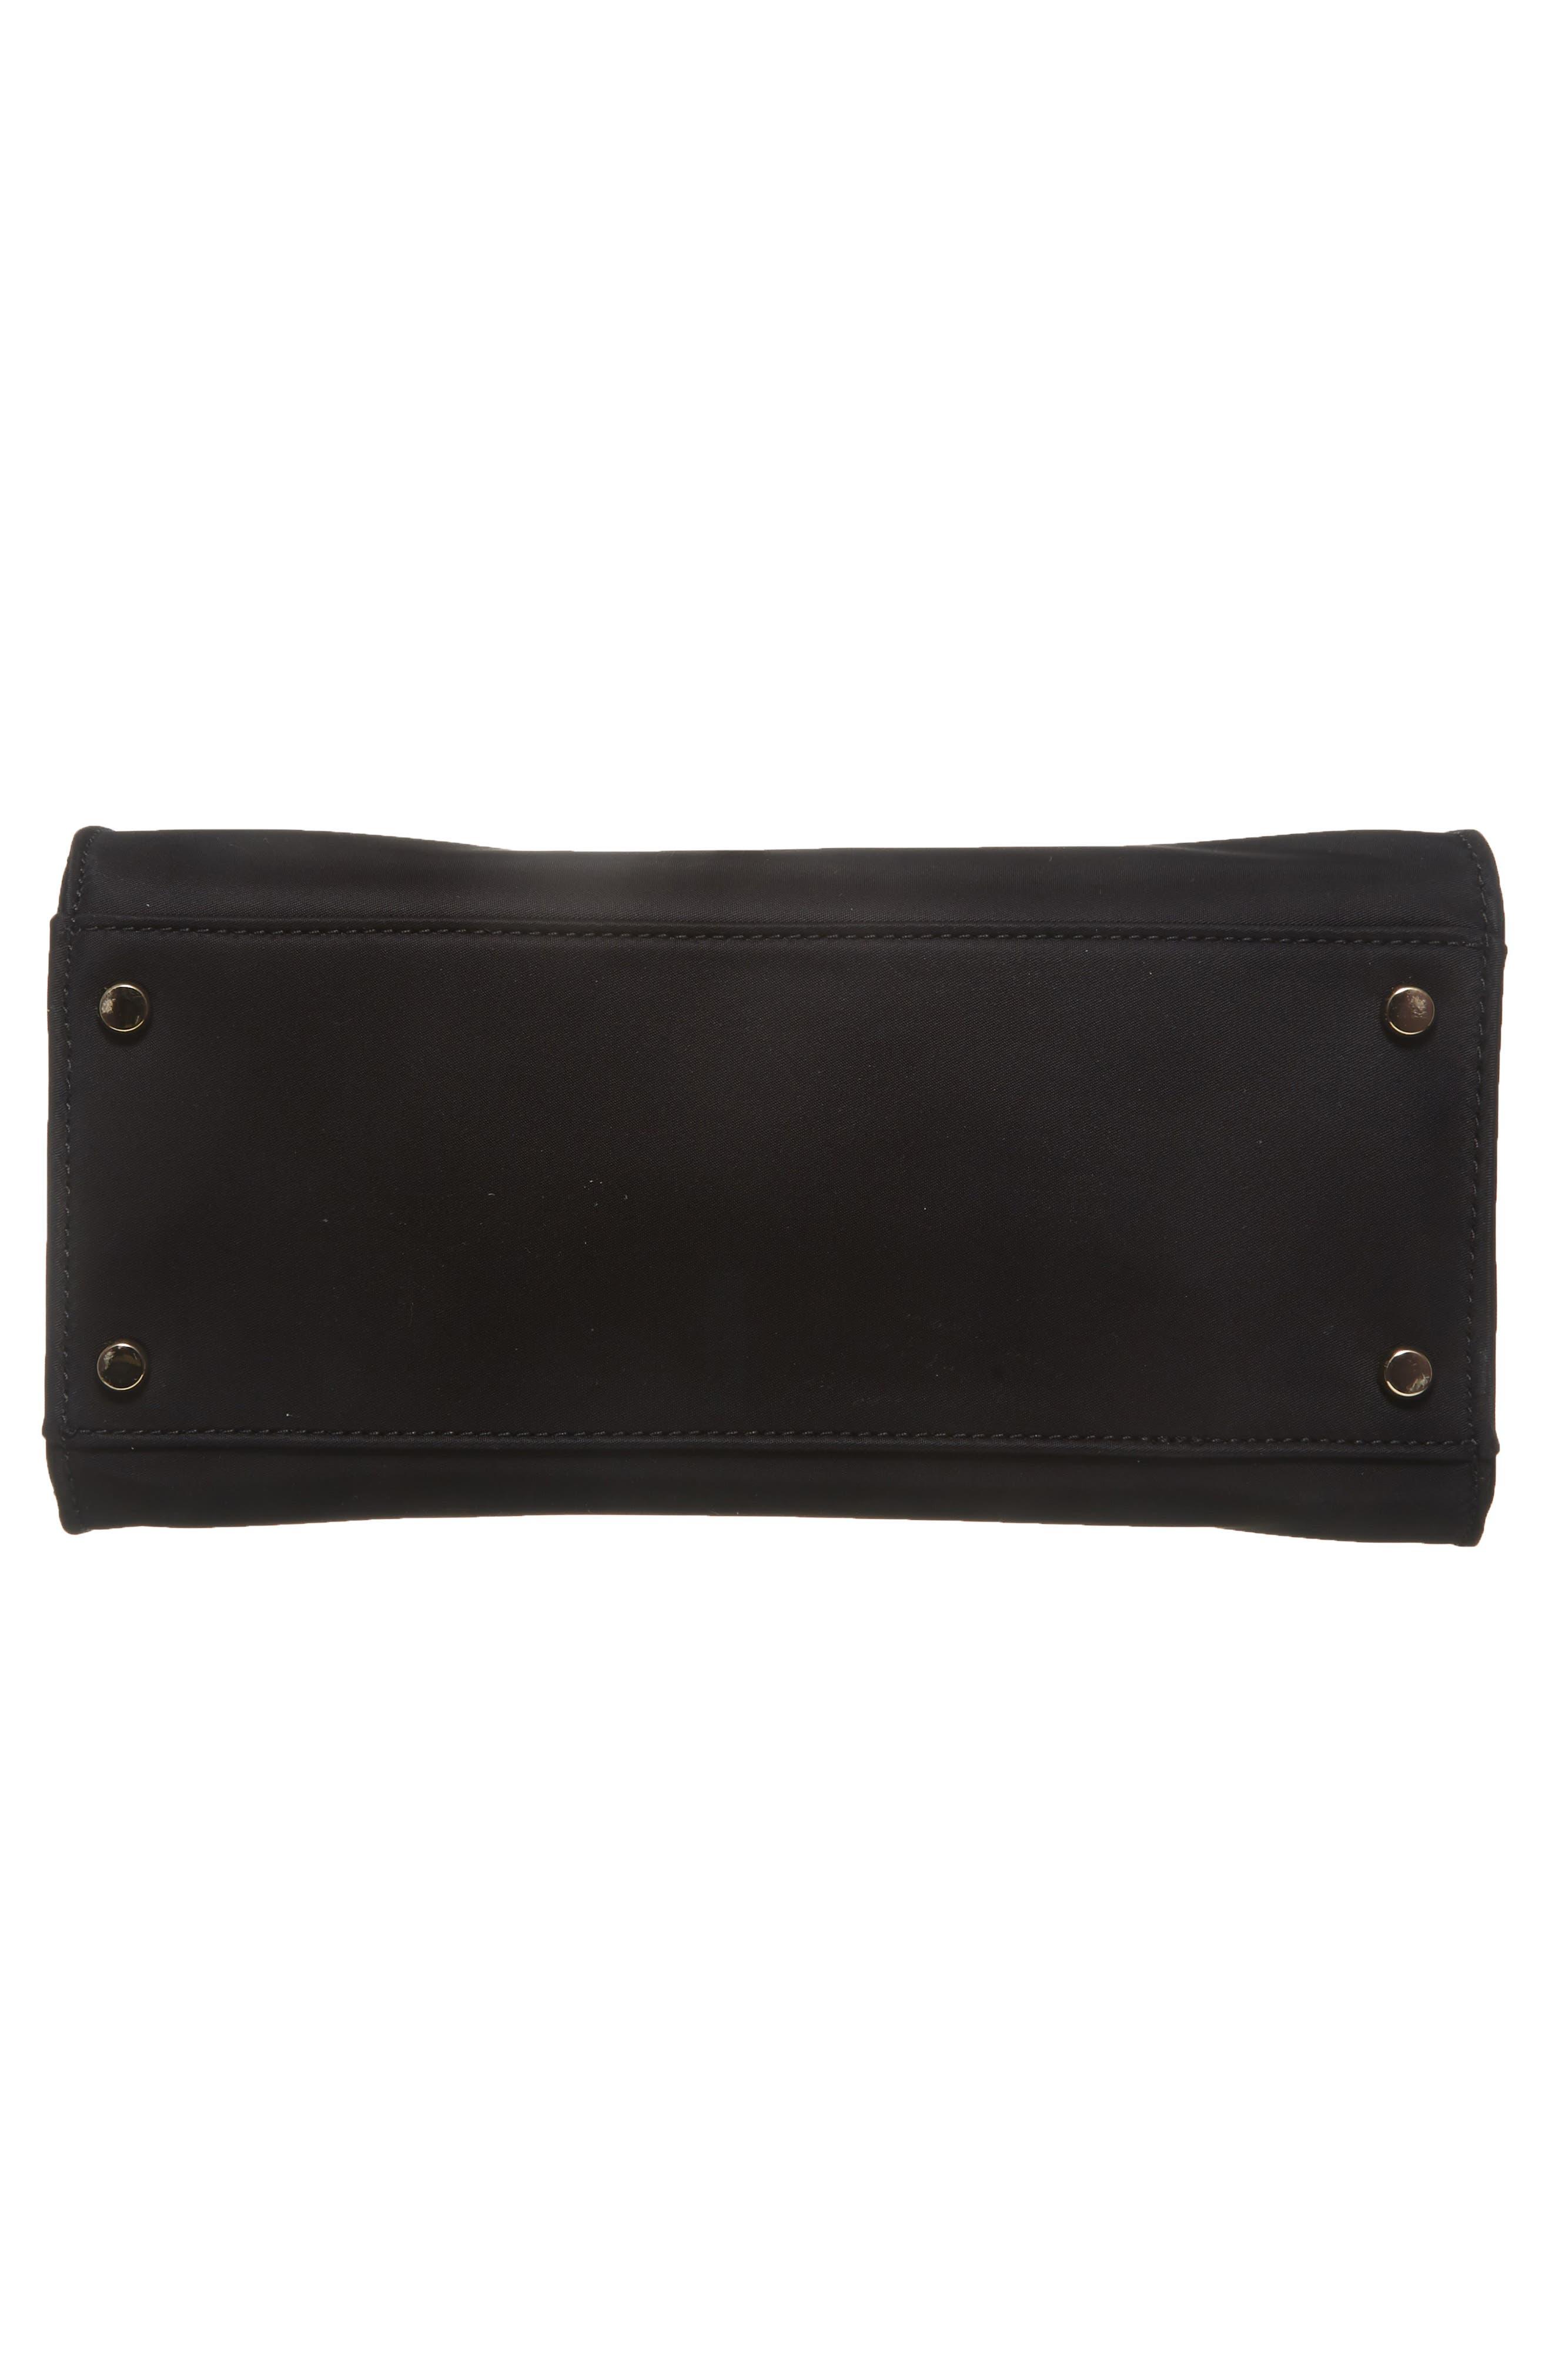 watson lane – sam nylon satchel,                             Alternate thumbnail 6, color,                             BLACK